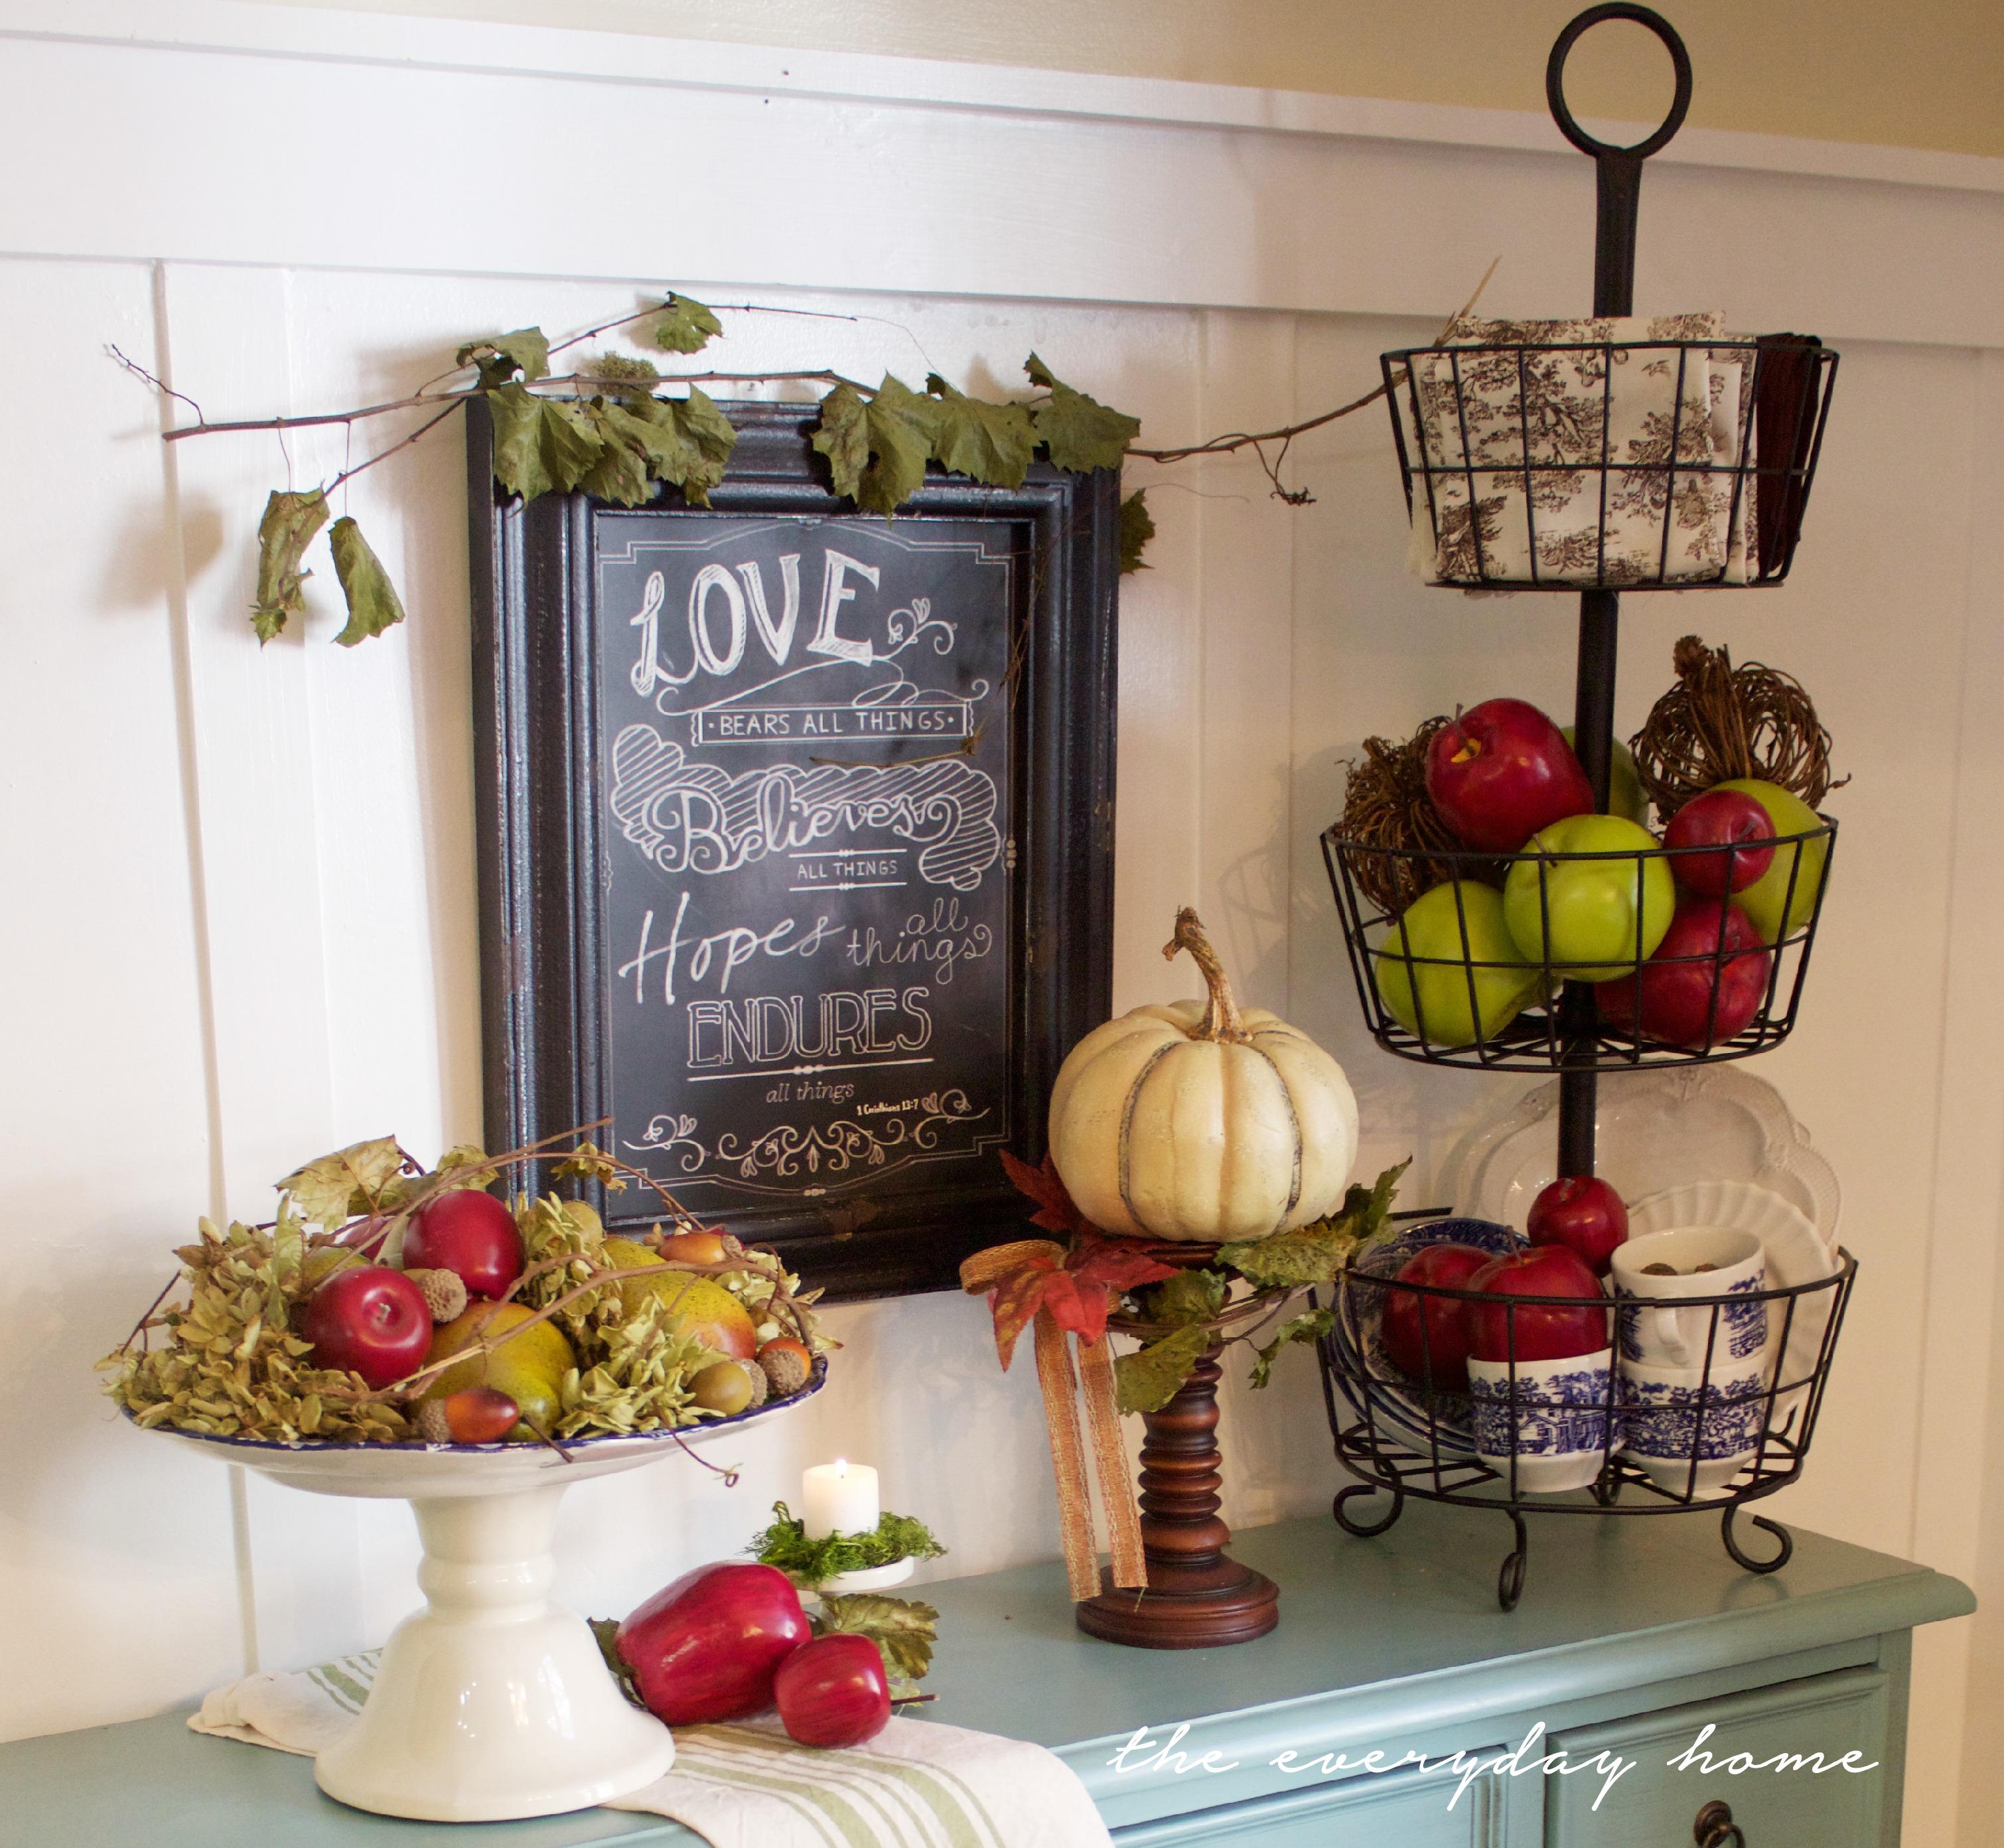 Farmhouse Breakfast Room Vignette | The Everyday Home | www.everydayhomeblog.com